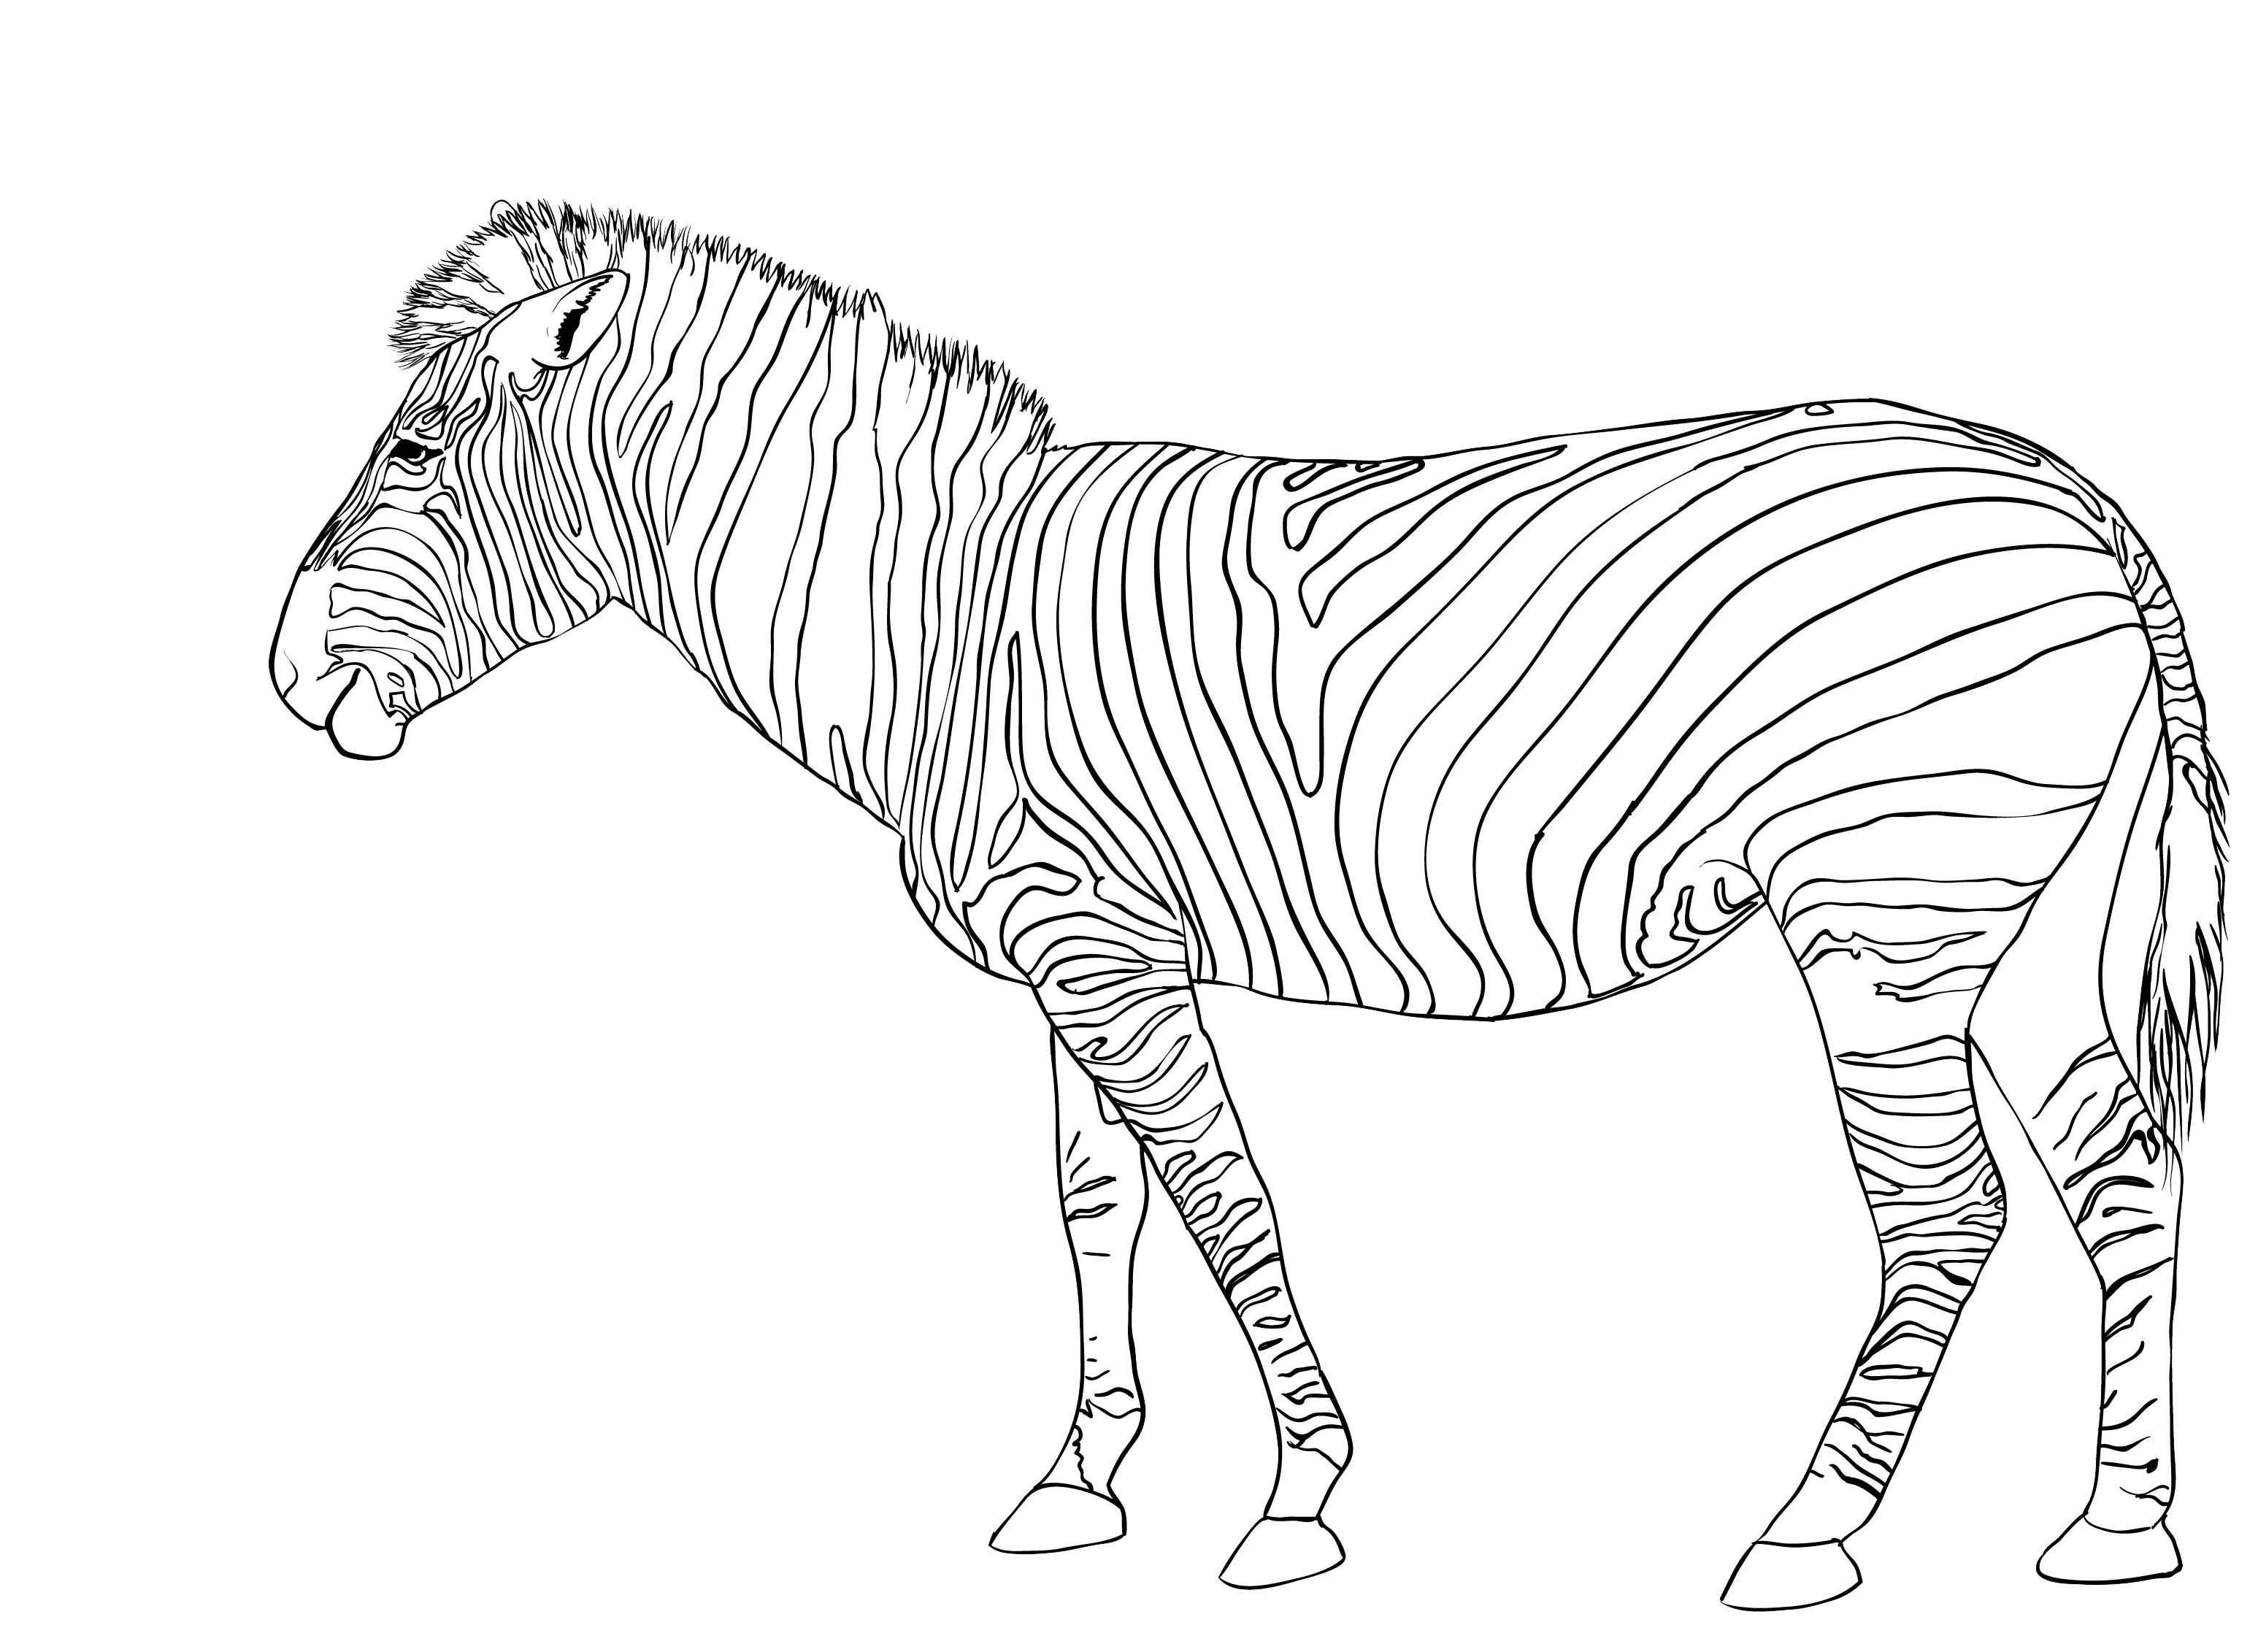 Printable coloring pictures of zebras - Zebra